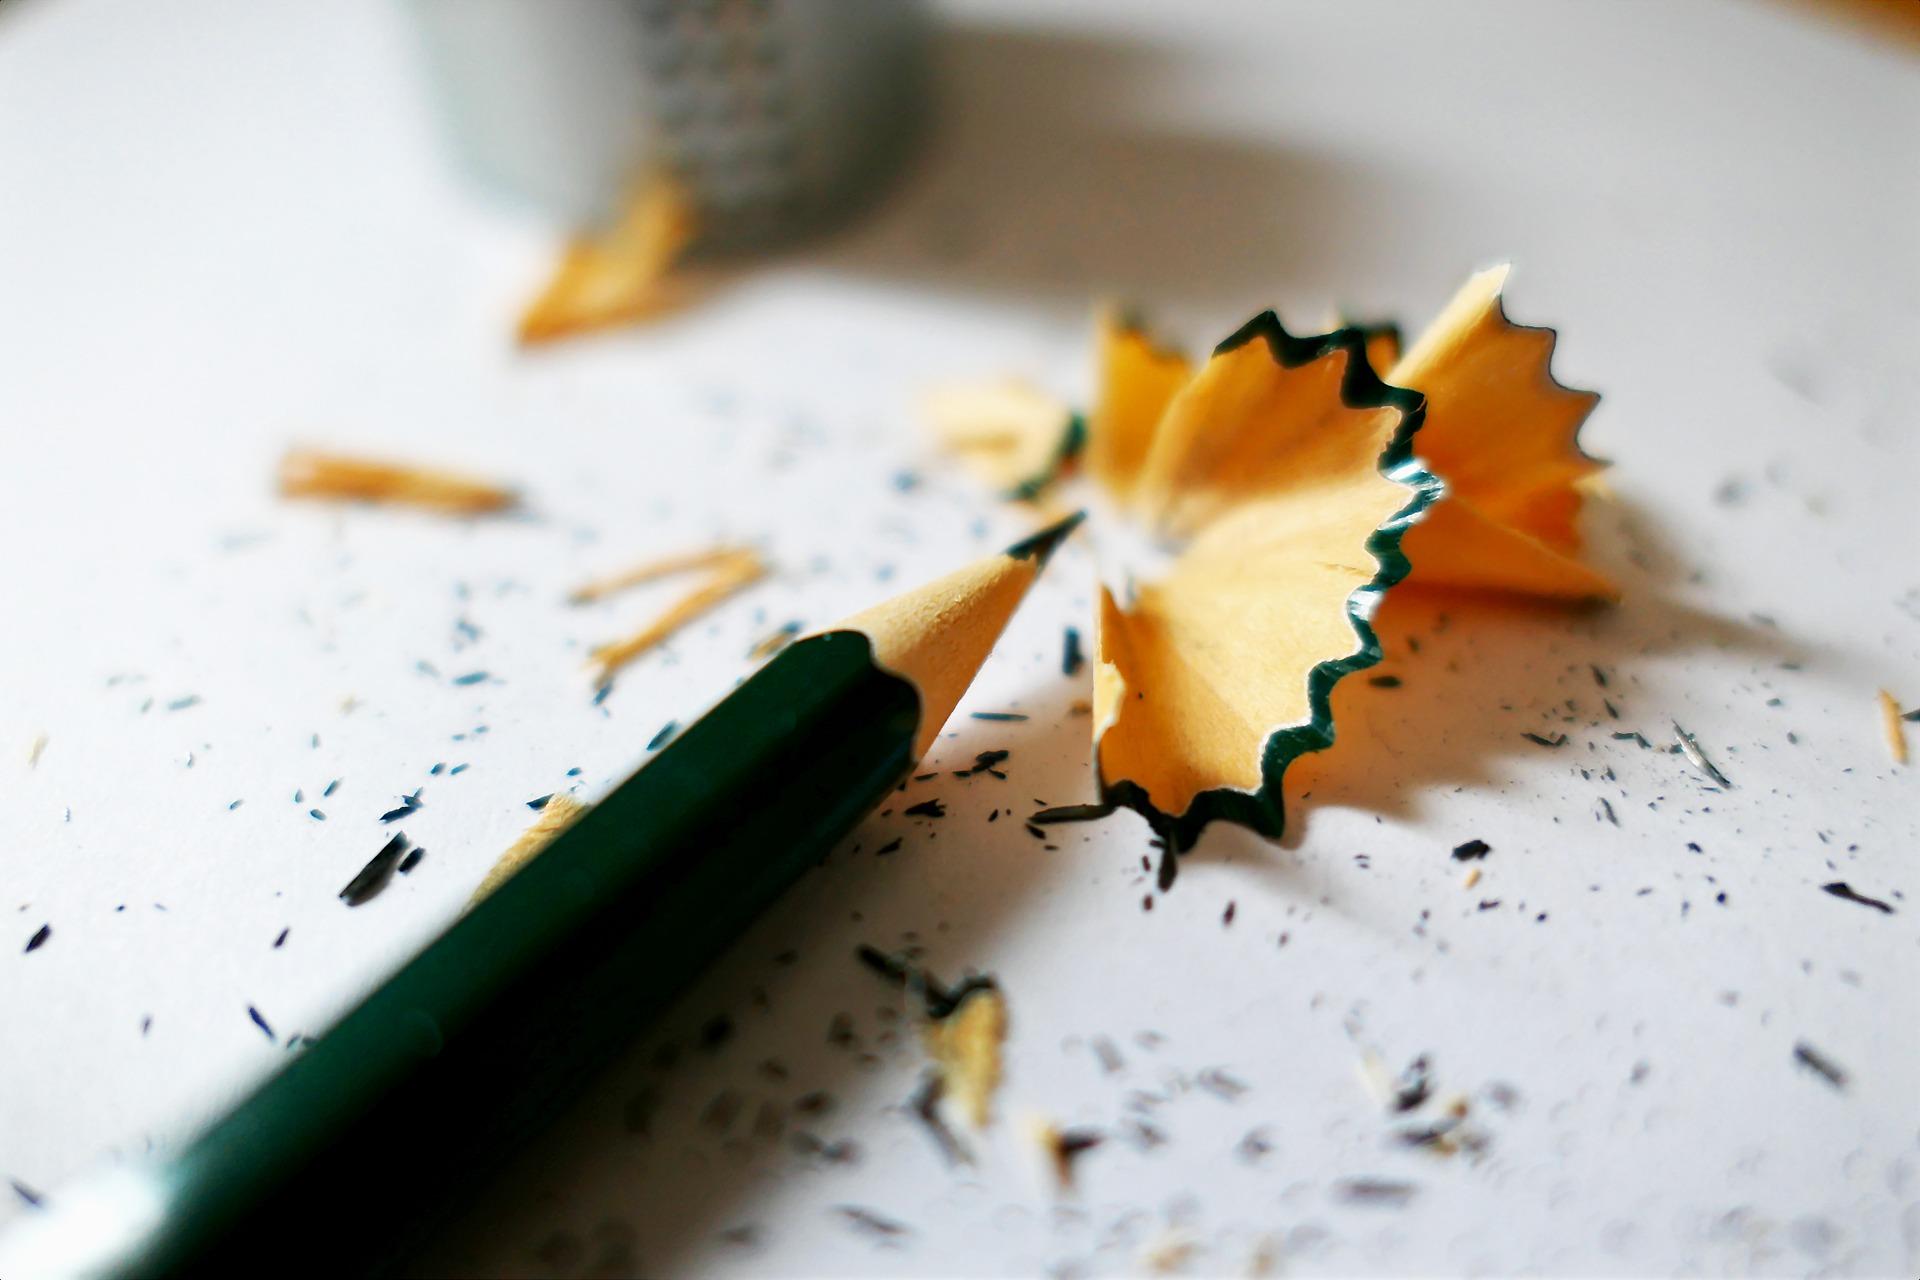 pencil_sharp-drop-2086417_1920.jpg